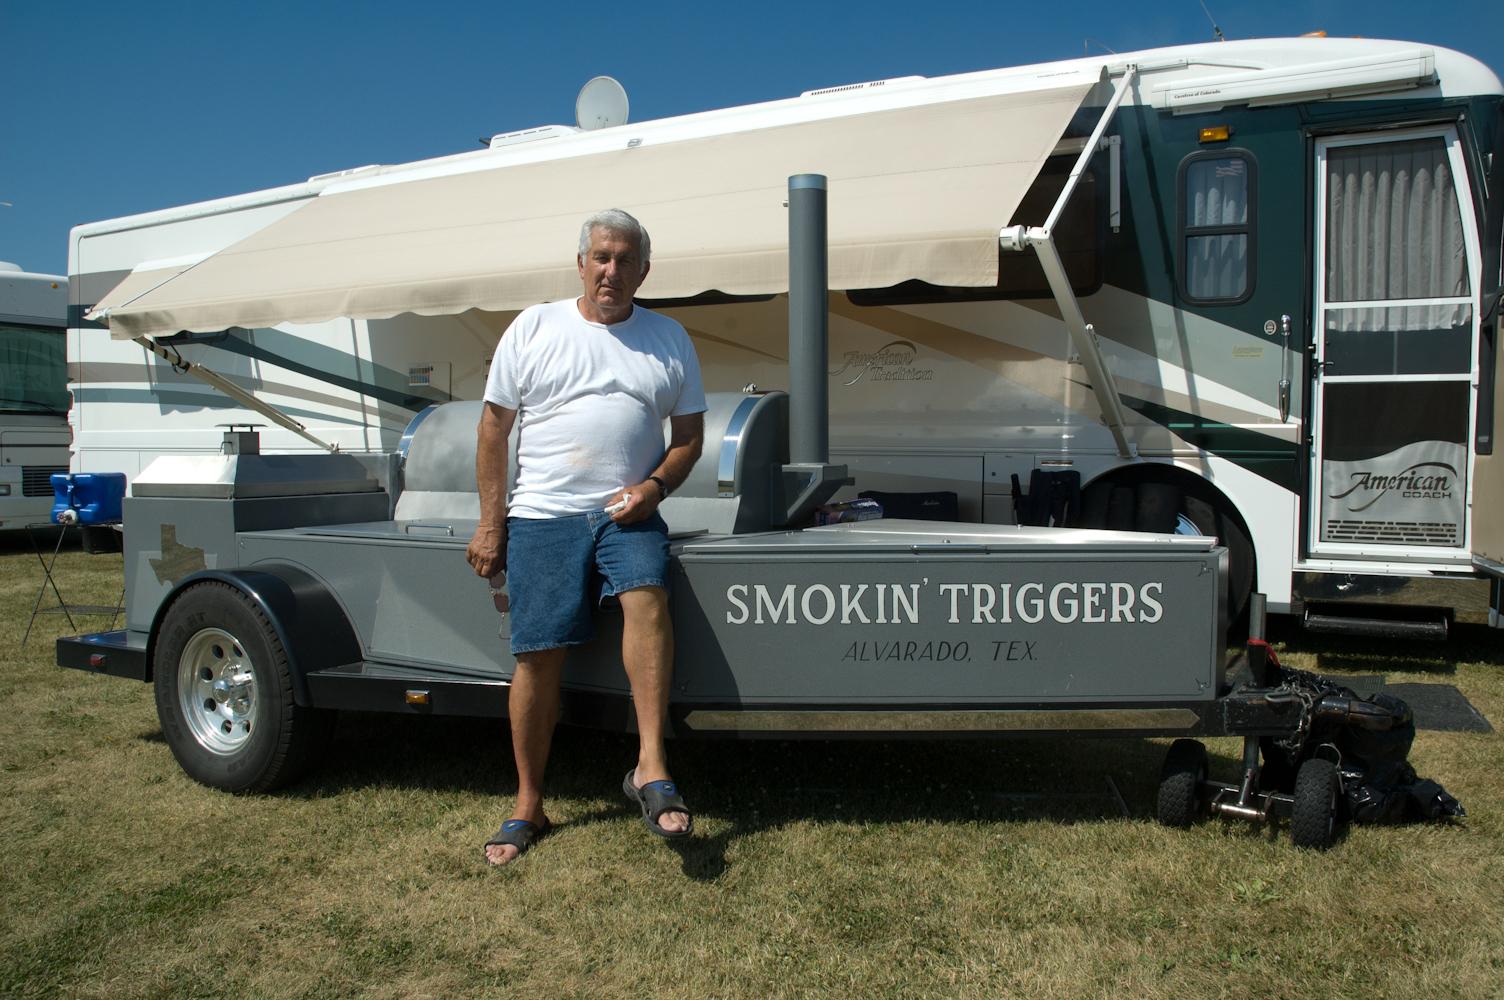 Jambo Backyard Smoker : Jambo Barbeque Pits httpwwwpic2flycomJambo+Barbeque+Pitshtml